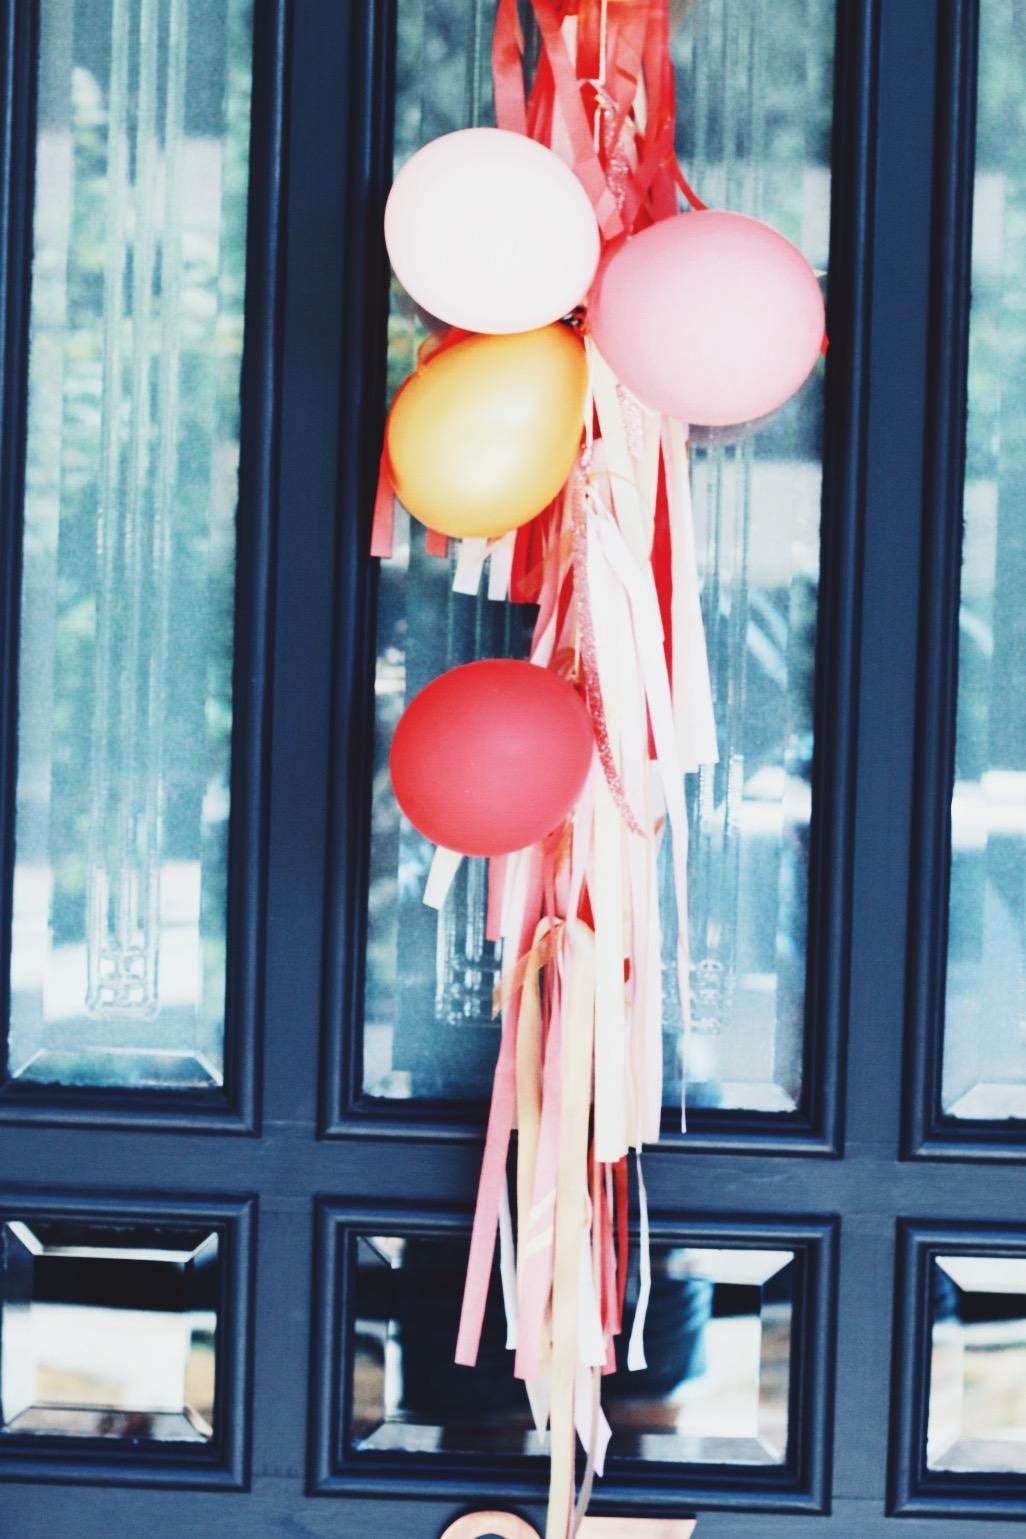 liftedballoons-.doorswag-mini-balloon-pearls-birthday-party-danville-ca